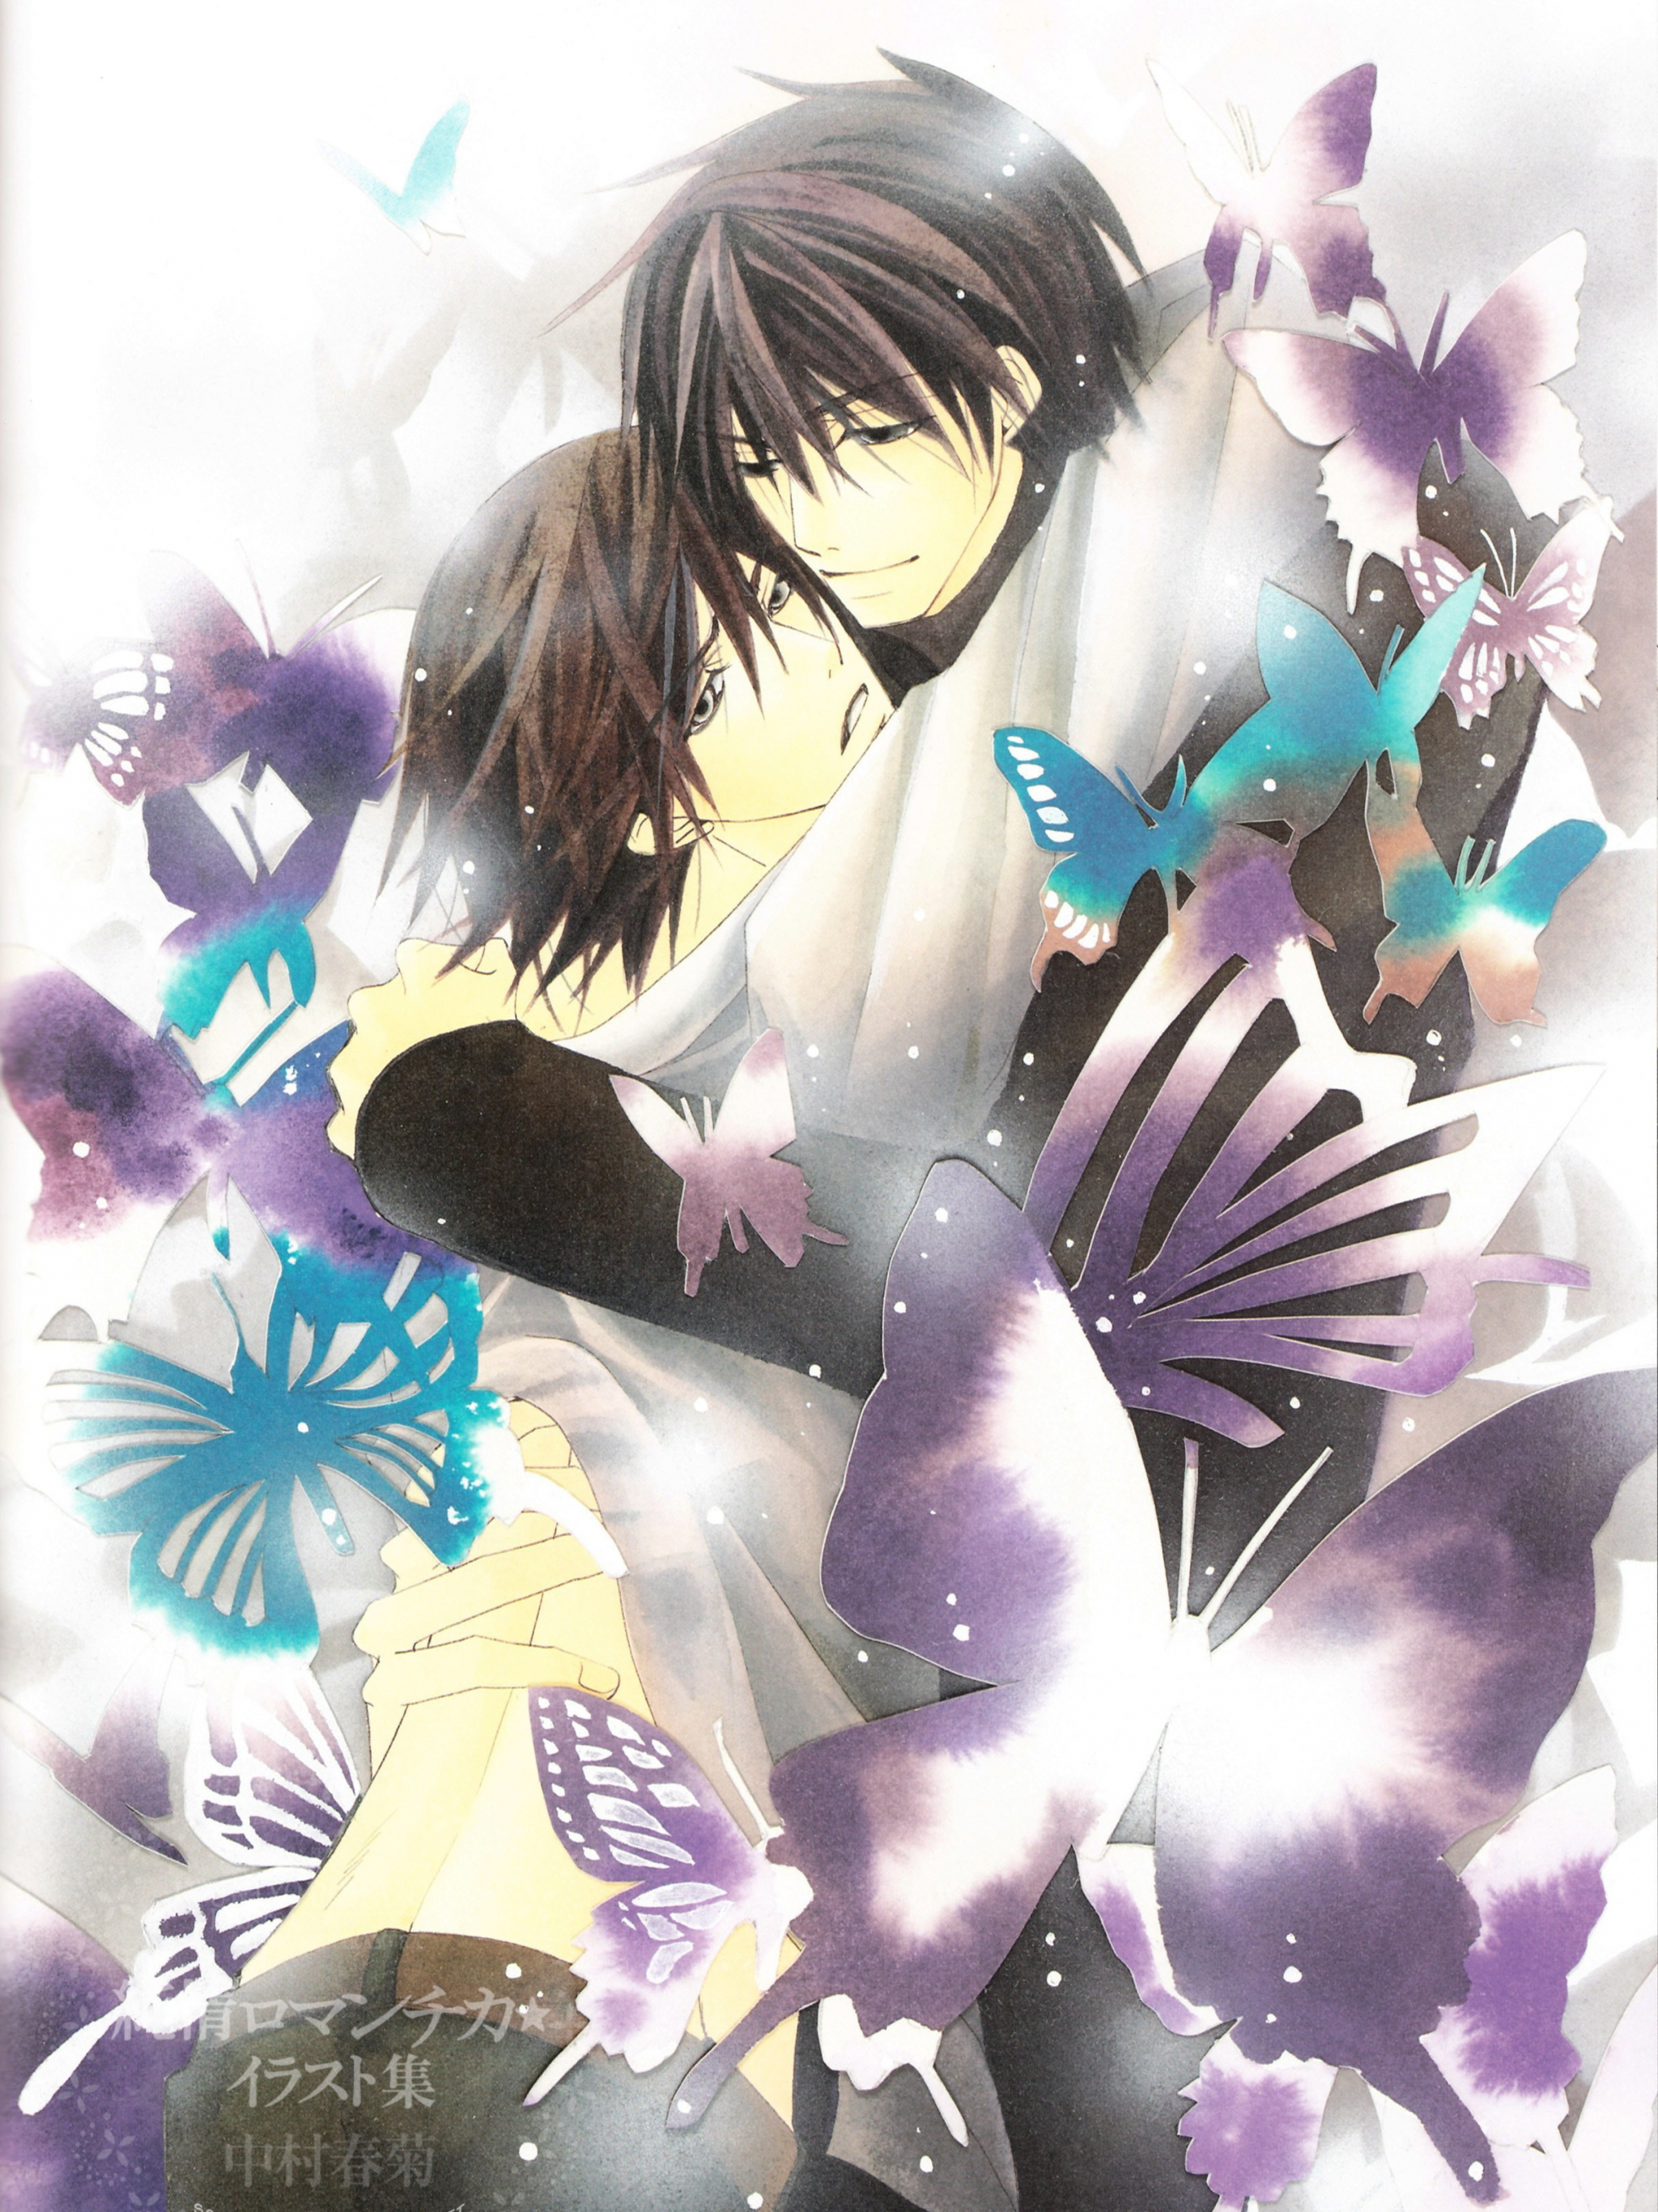 Free Download Junjou Egoist Mobile Wallpaper Zerochan Anime Image